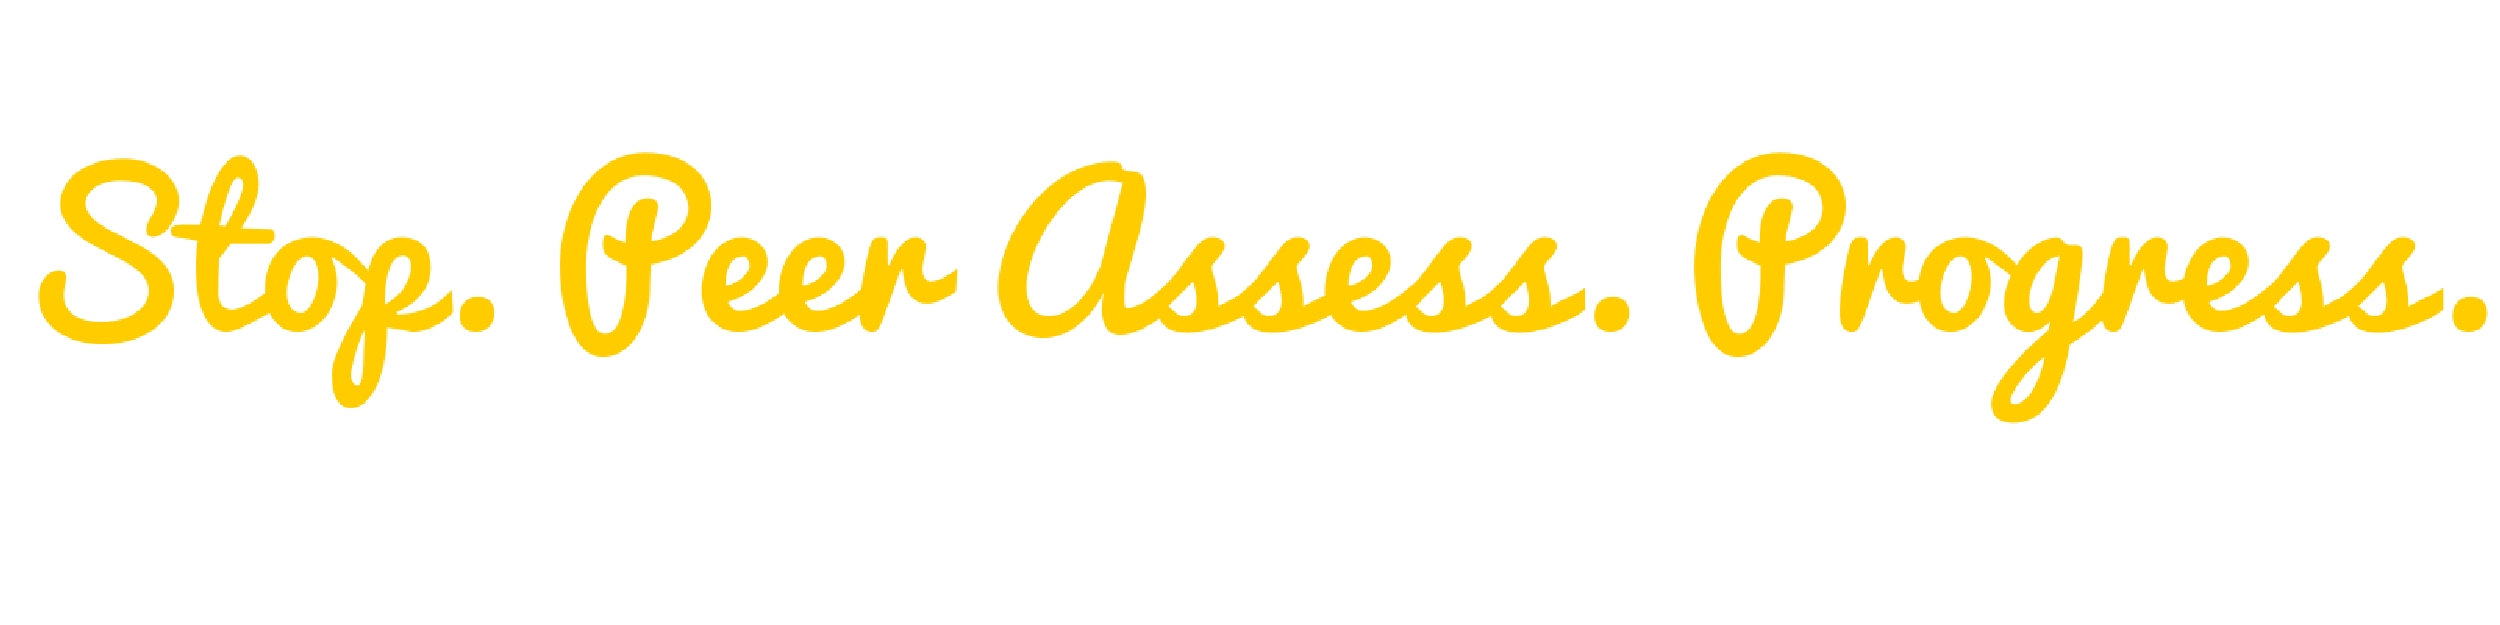 stop peer assess progress